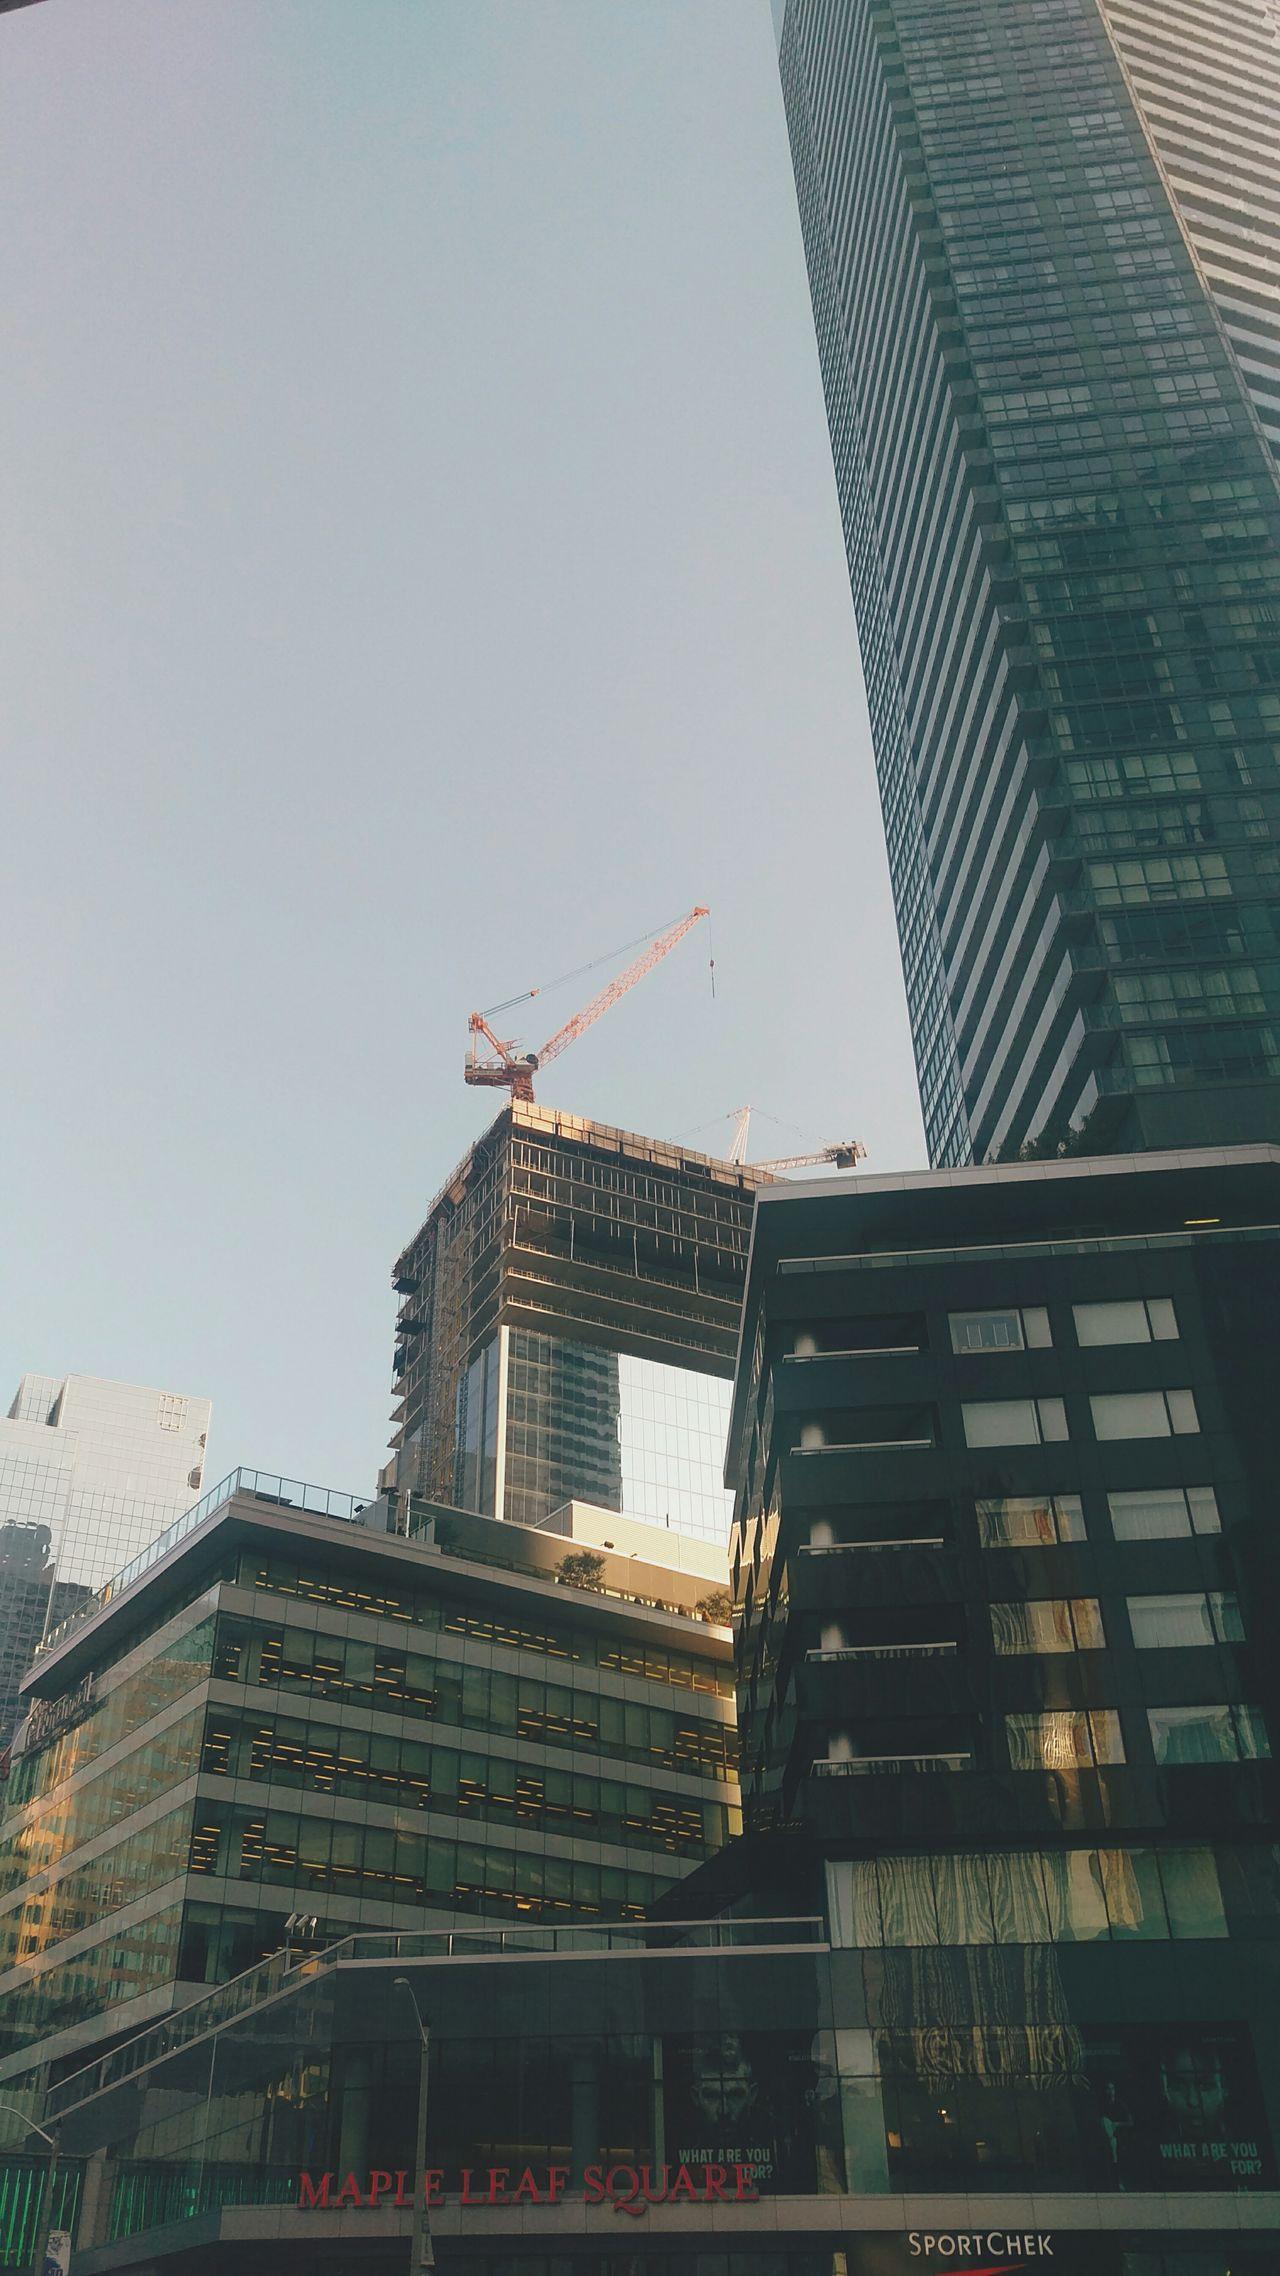 Vscocam #vsco SonyNEX5n Urbanexploration Architecture_collection